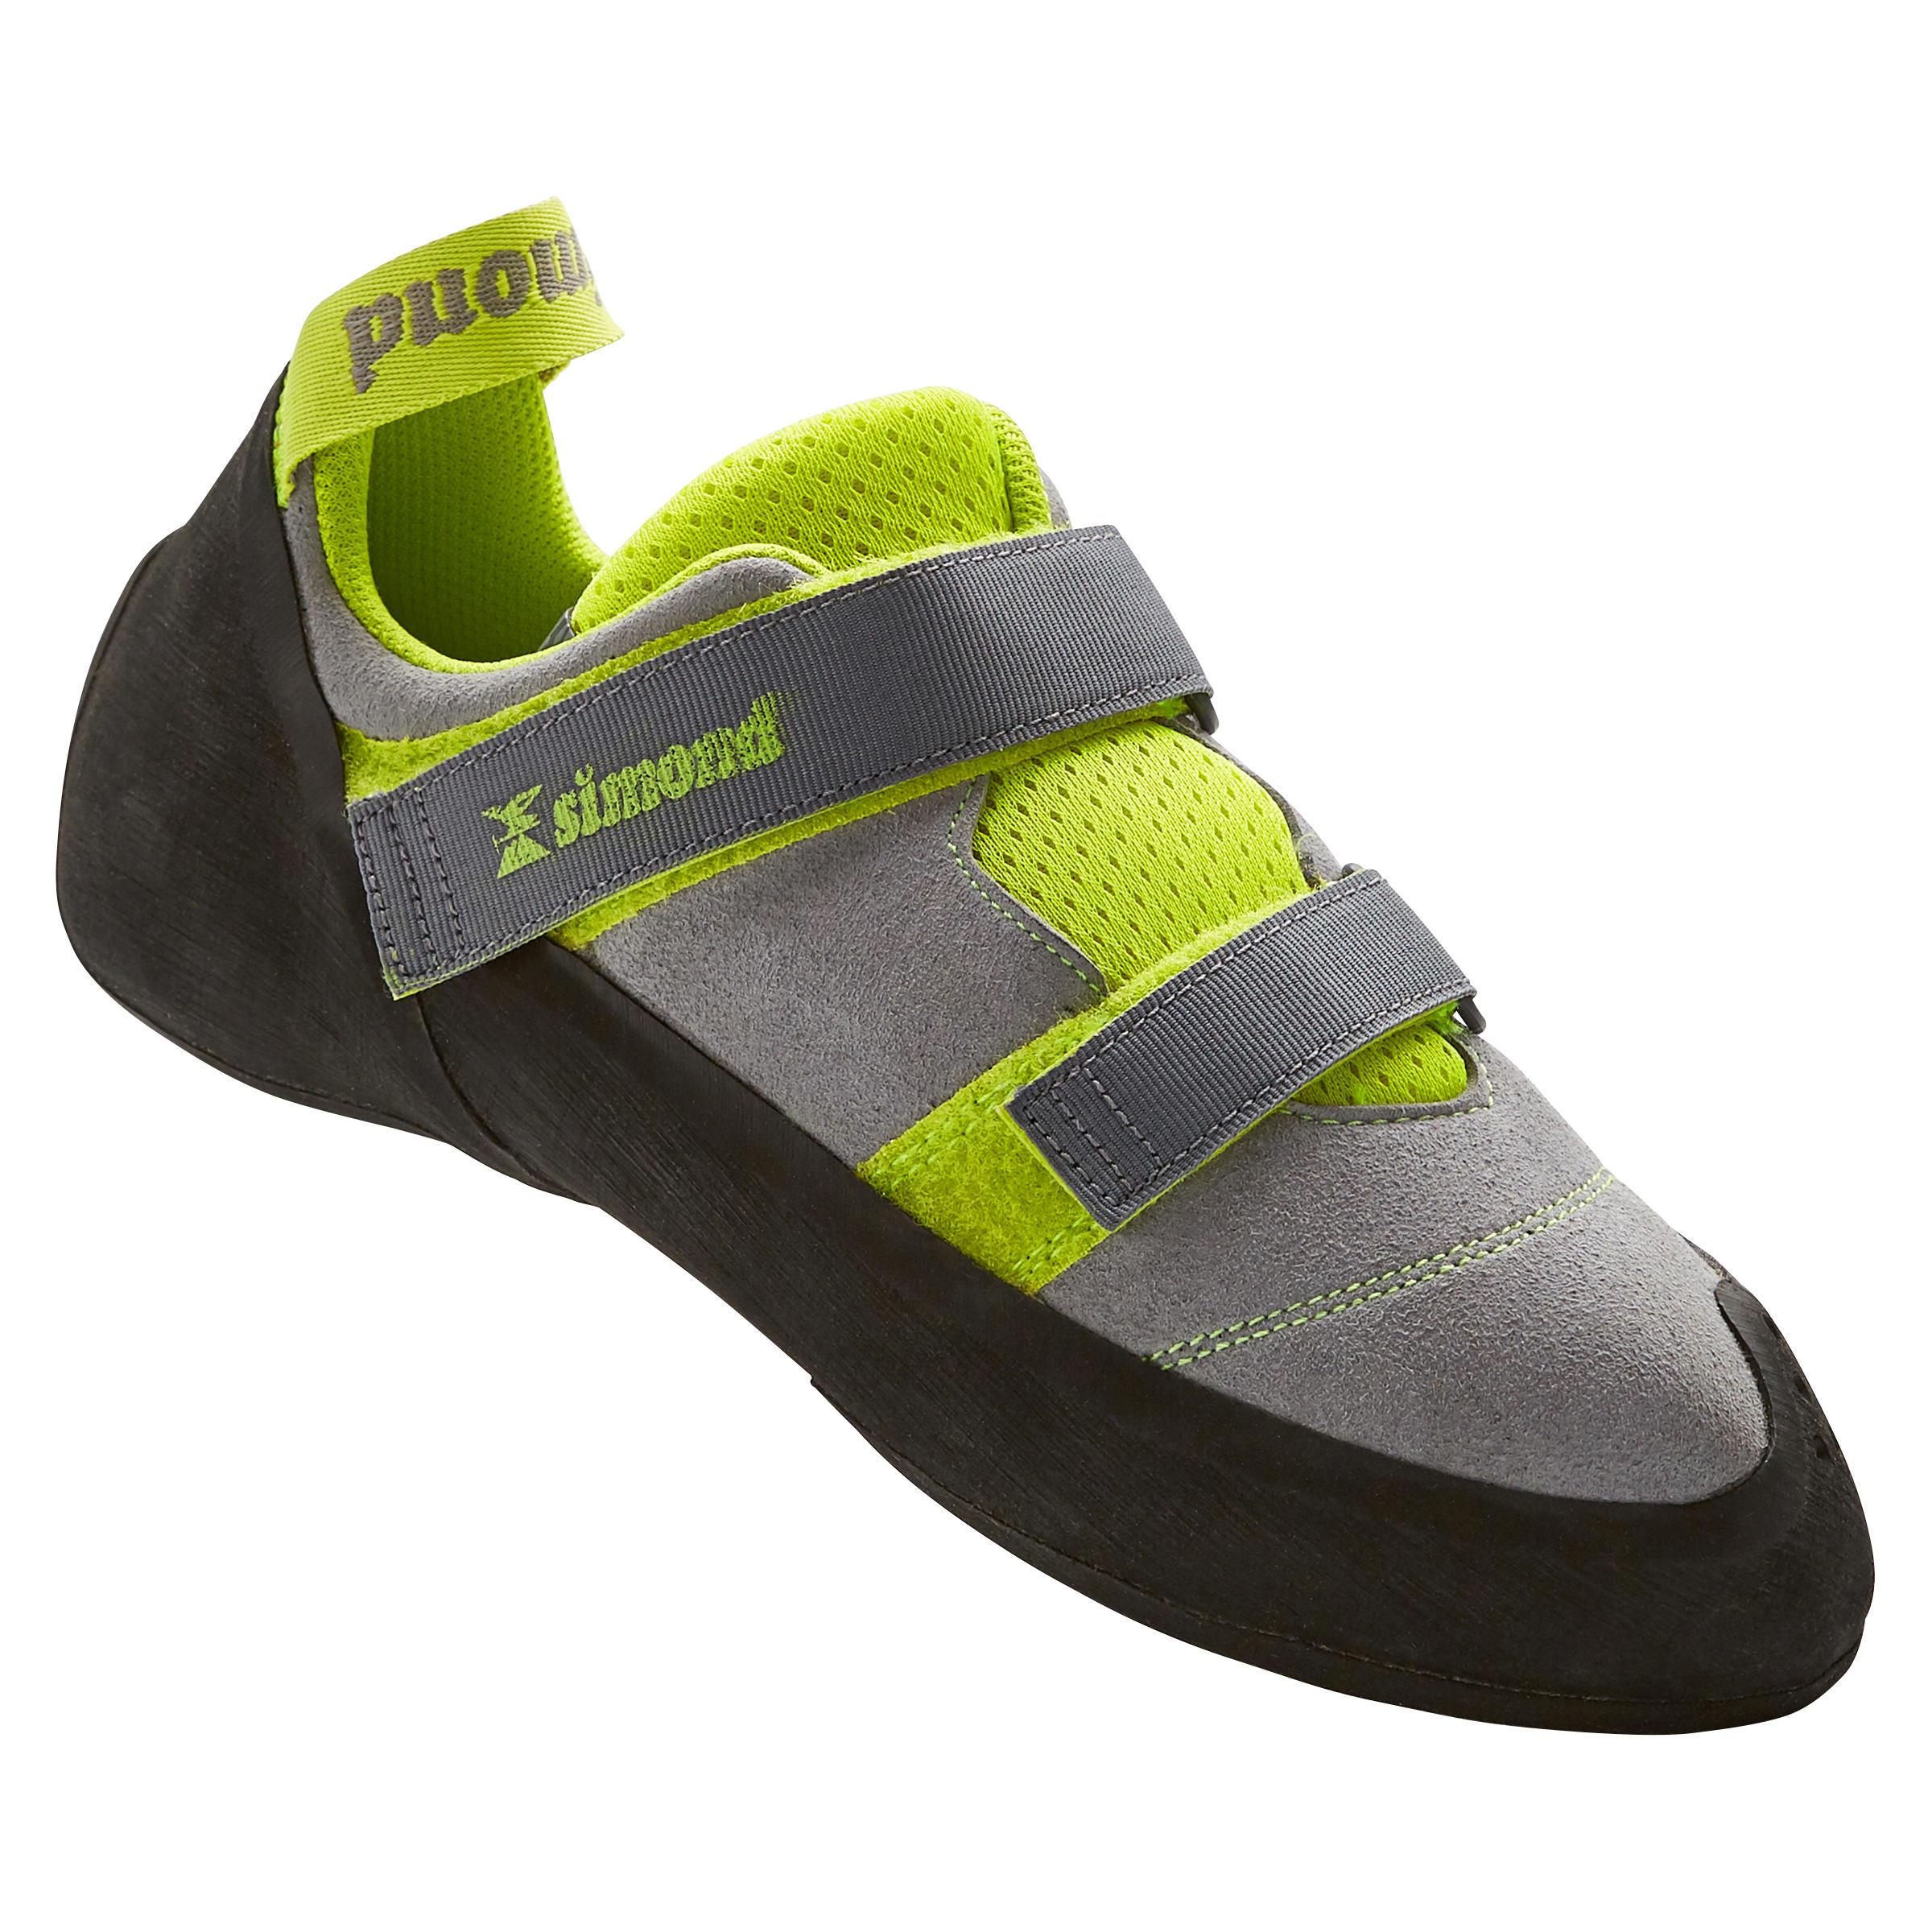 Kletterschuhe Rock+ Erwachsene grau | Schuhe > Outdoorschuhe > Kletterschuhe | Grau - Grün | Simond